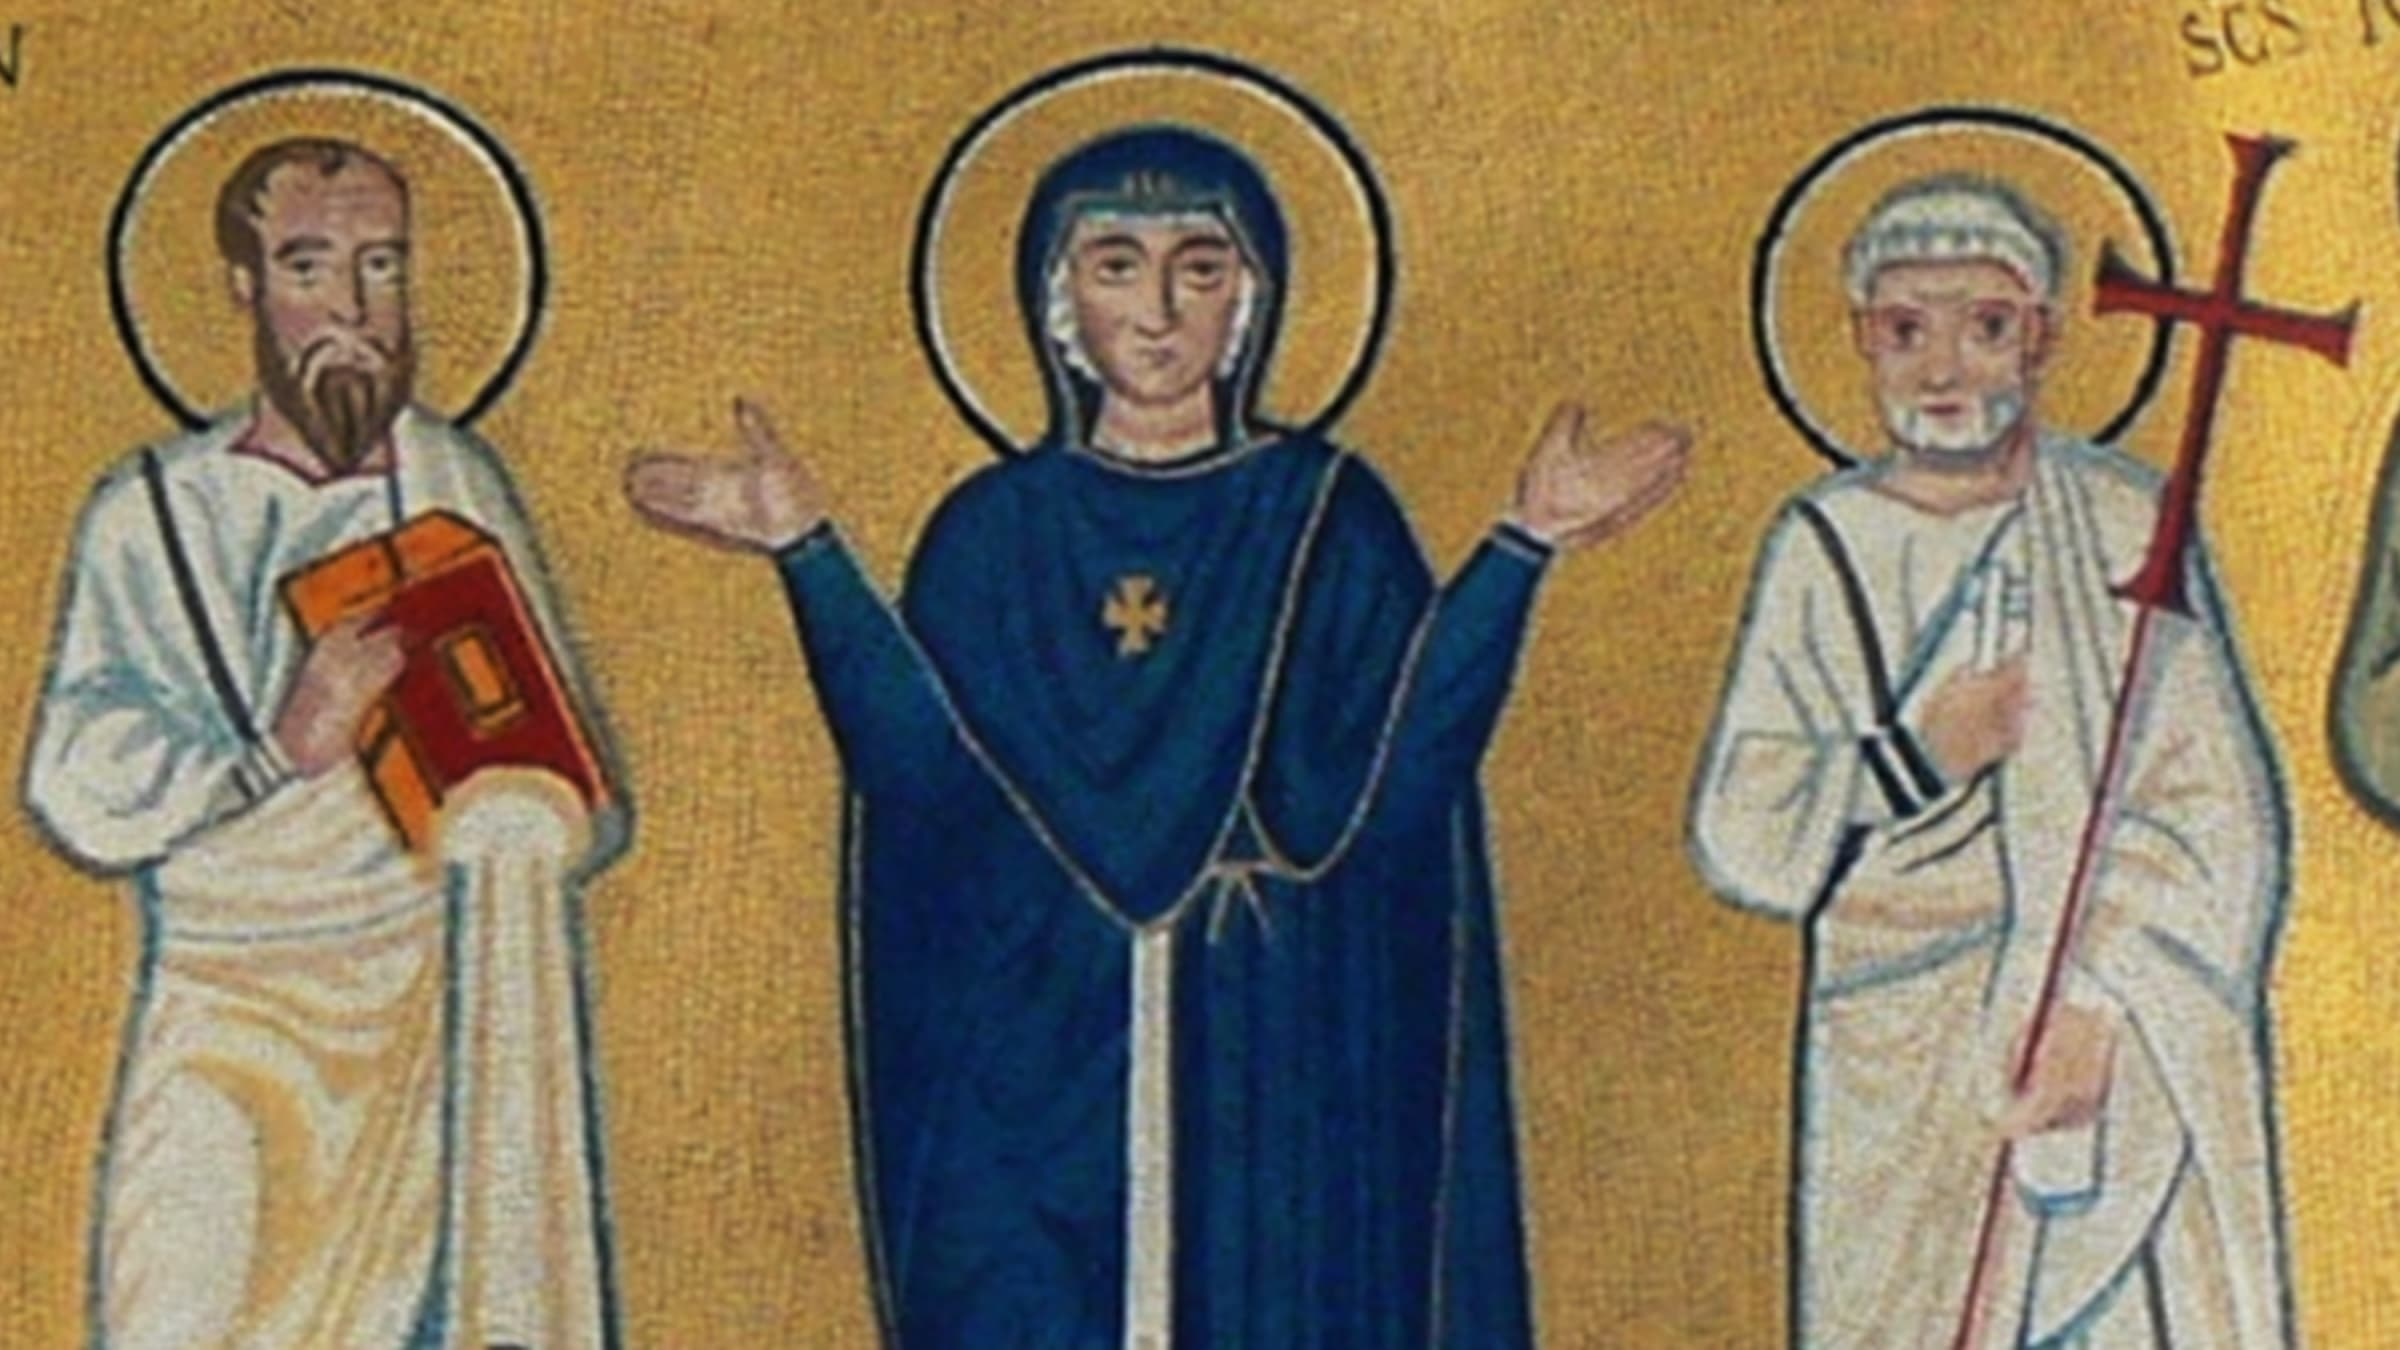 Did Vatican Hide Art That Depicted Female Priests?